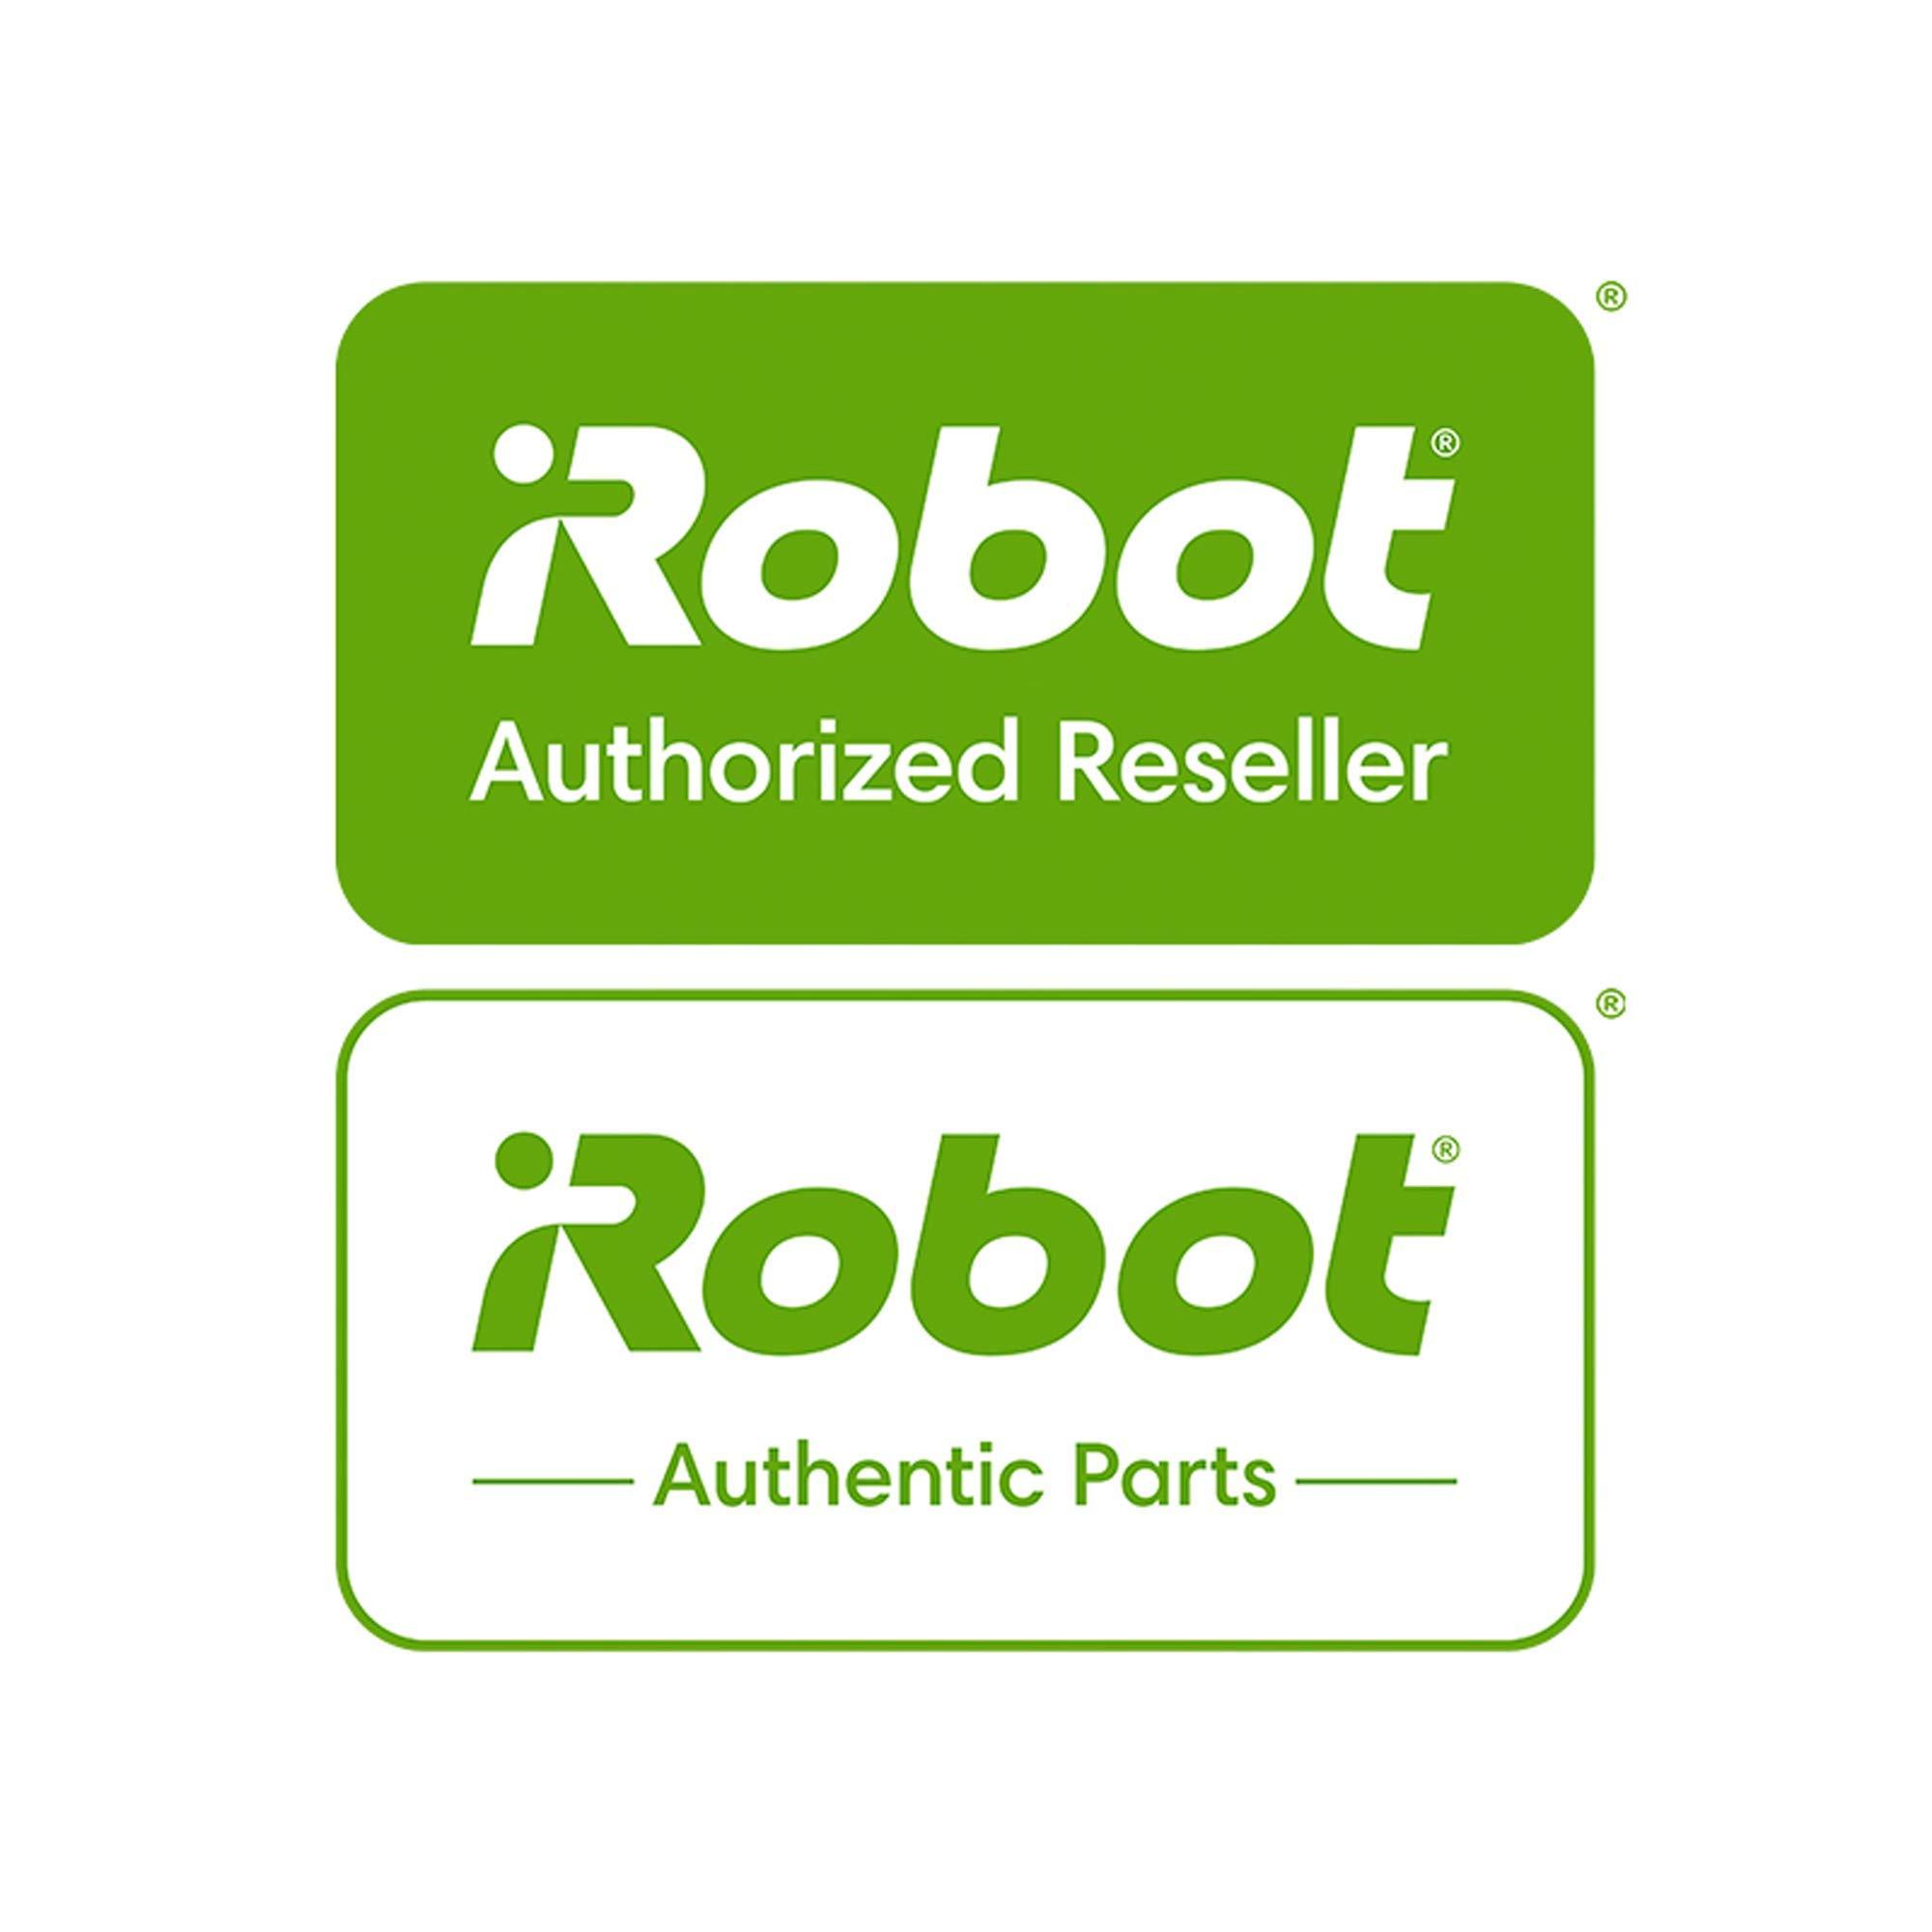 iRobot XLife Extended Life Battery Accessories Blue